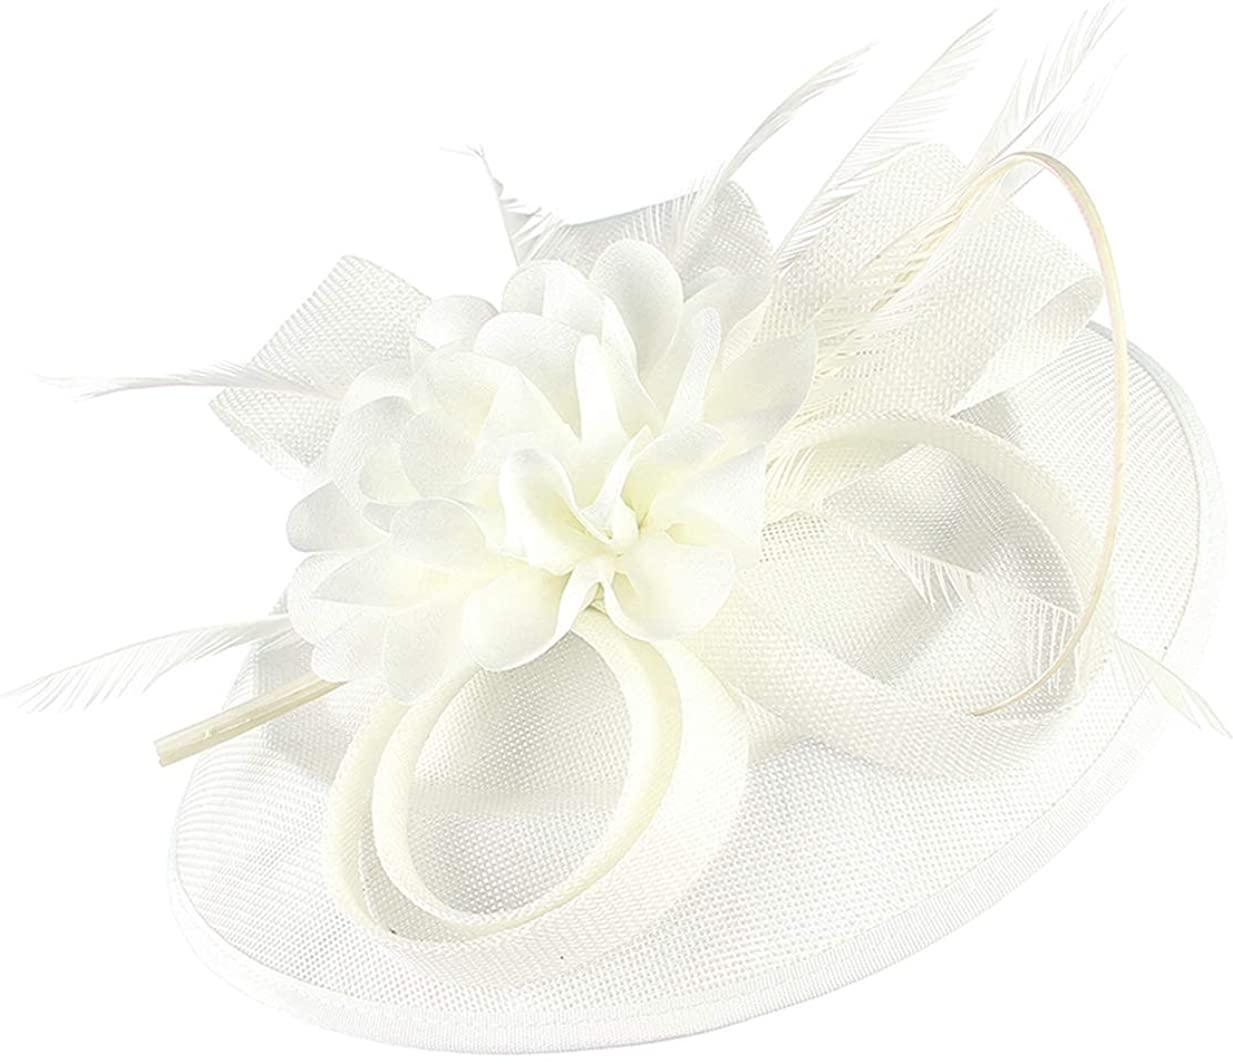 GEMVIE Women Elegant Fascinator Pillbox Hat Bridal Wedding Flower Feather Headband Hair Clips for Cocktail Royal Ascot